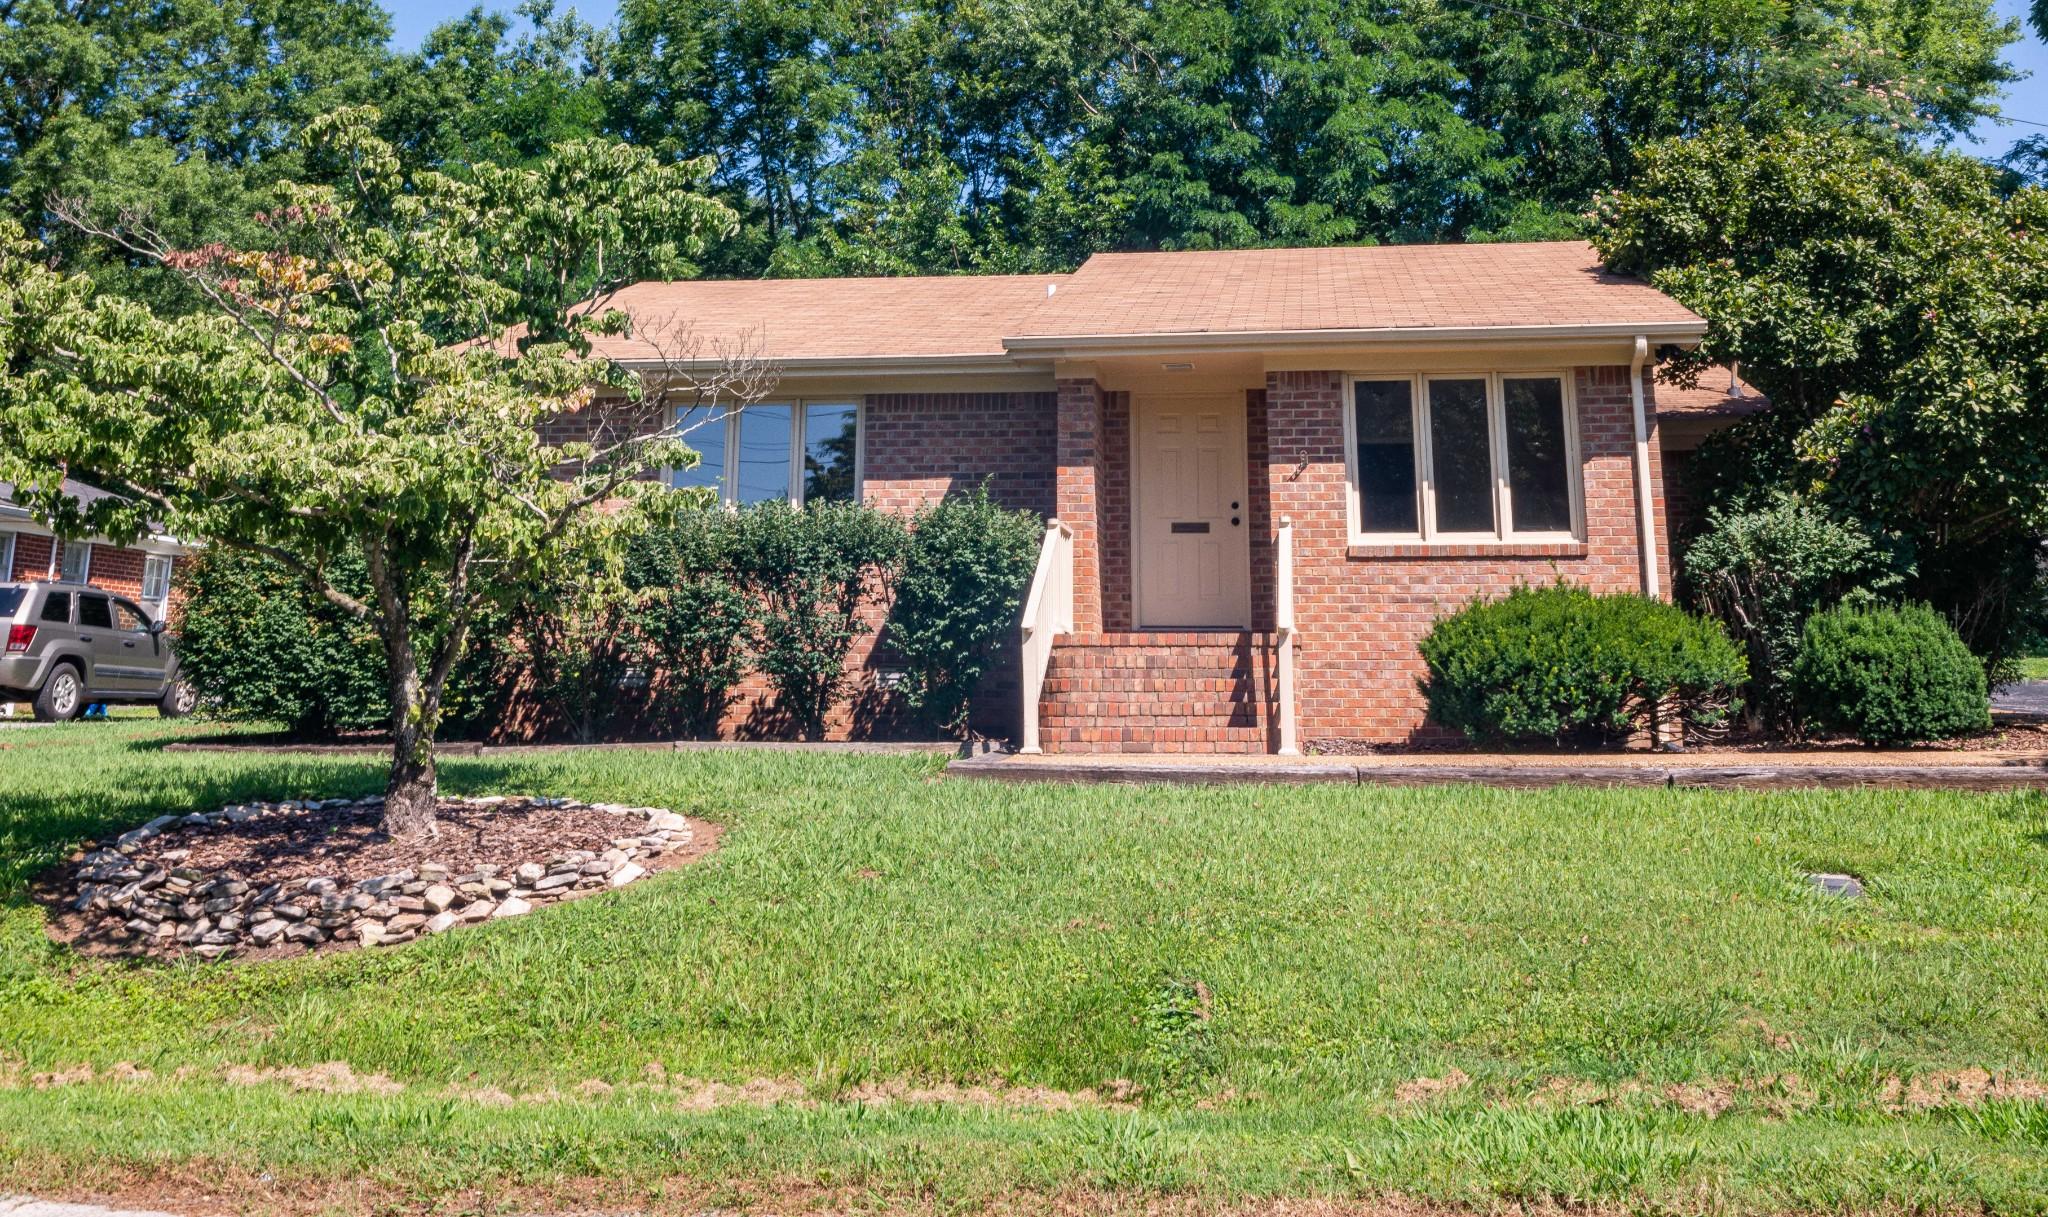 206 W Hogan St Property Photo - Tullahoma, TN real estate listing